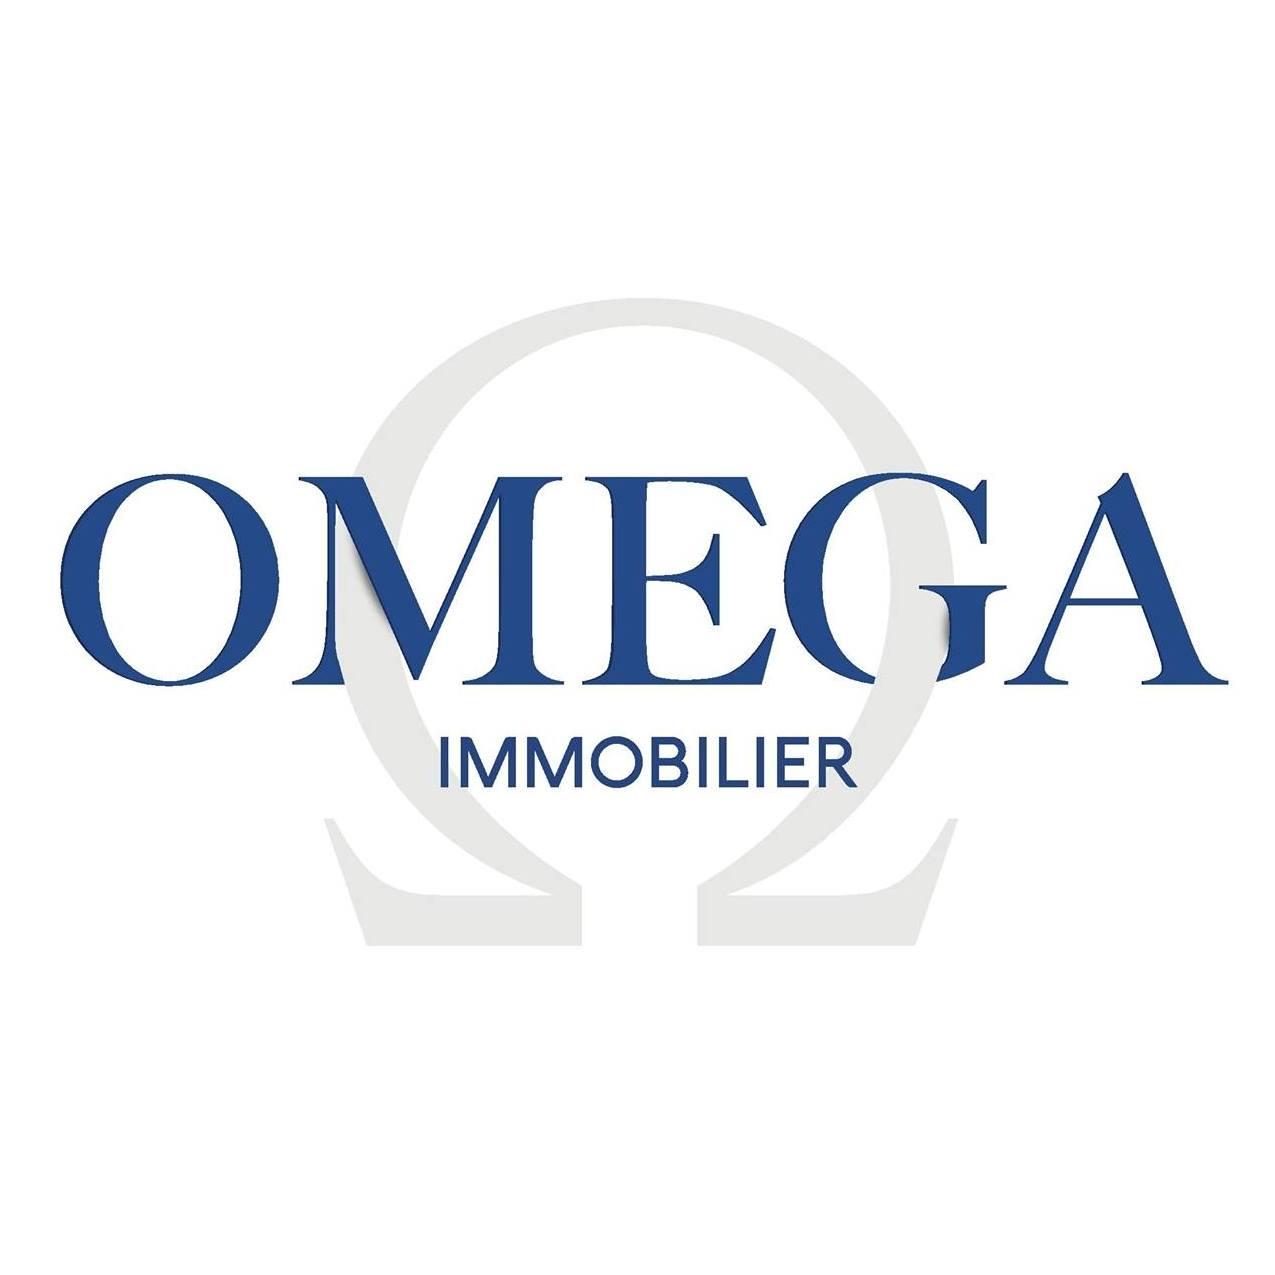 Omega Immobilier